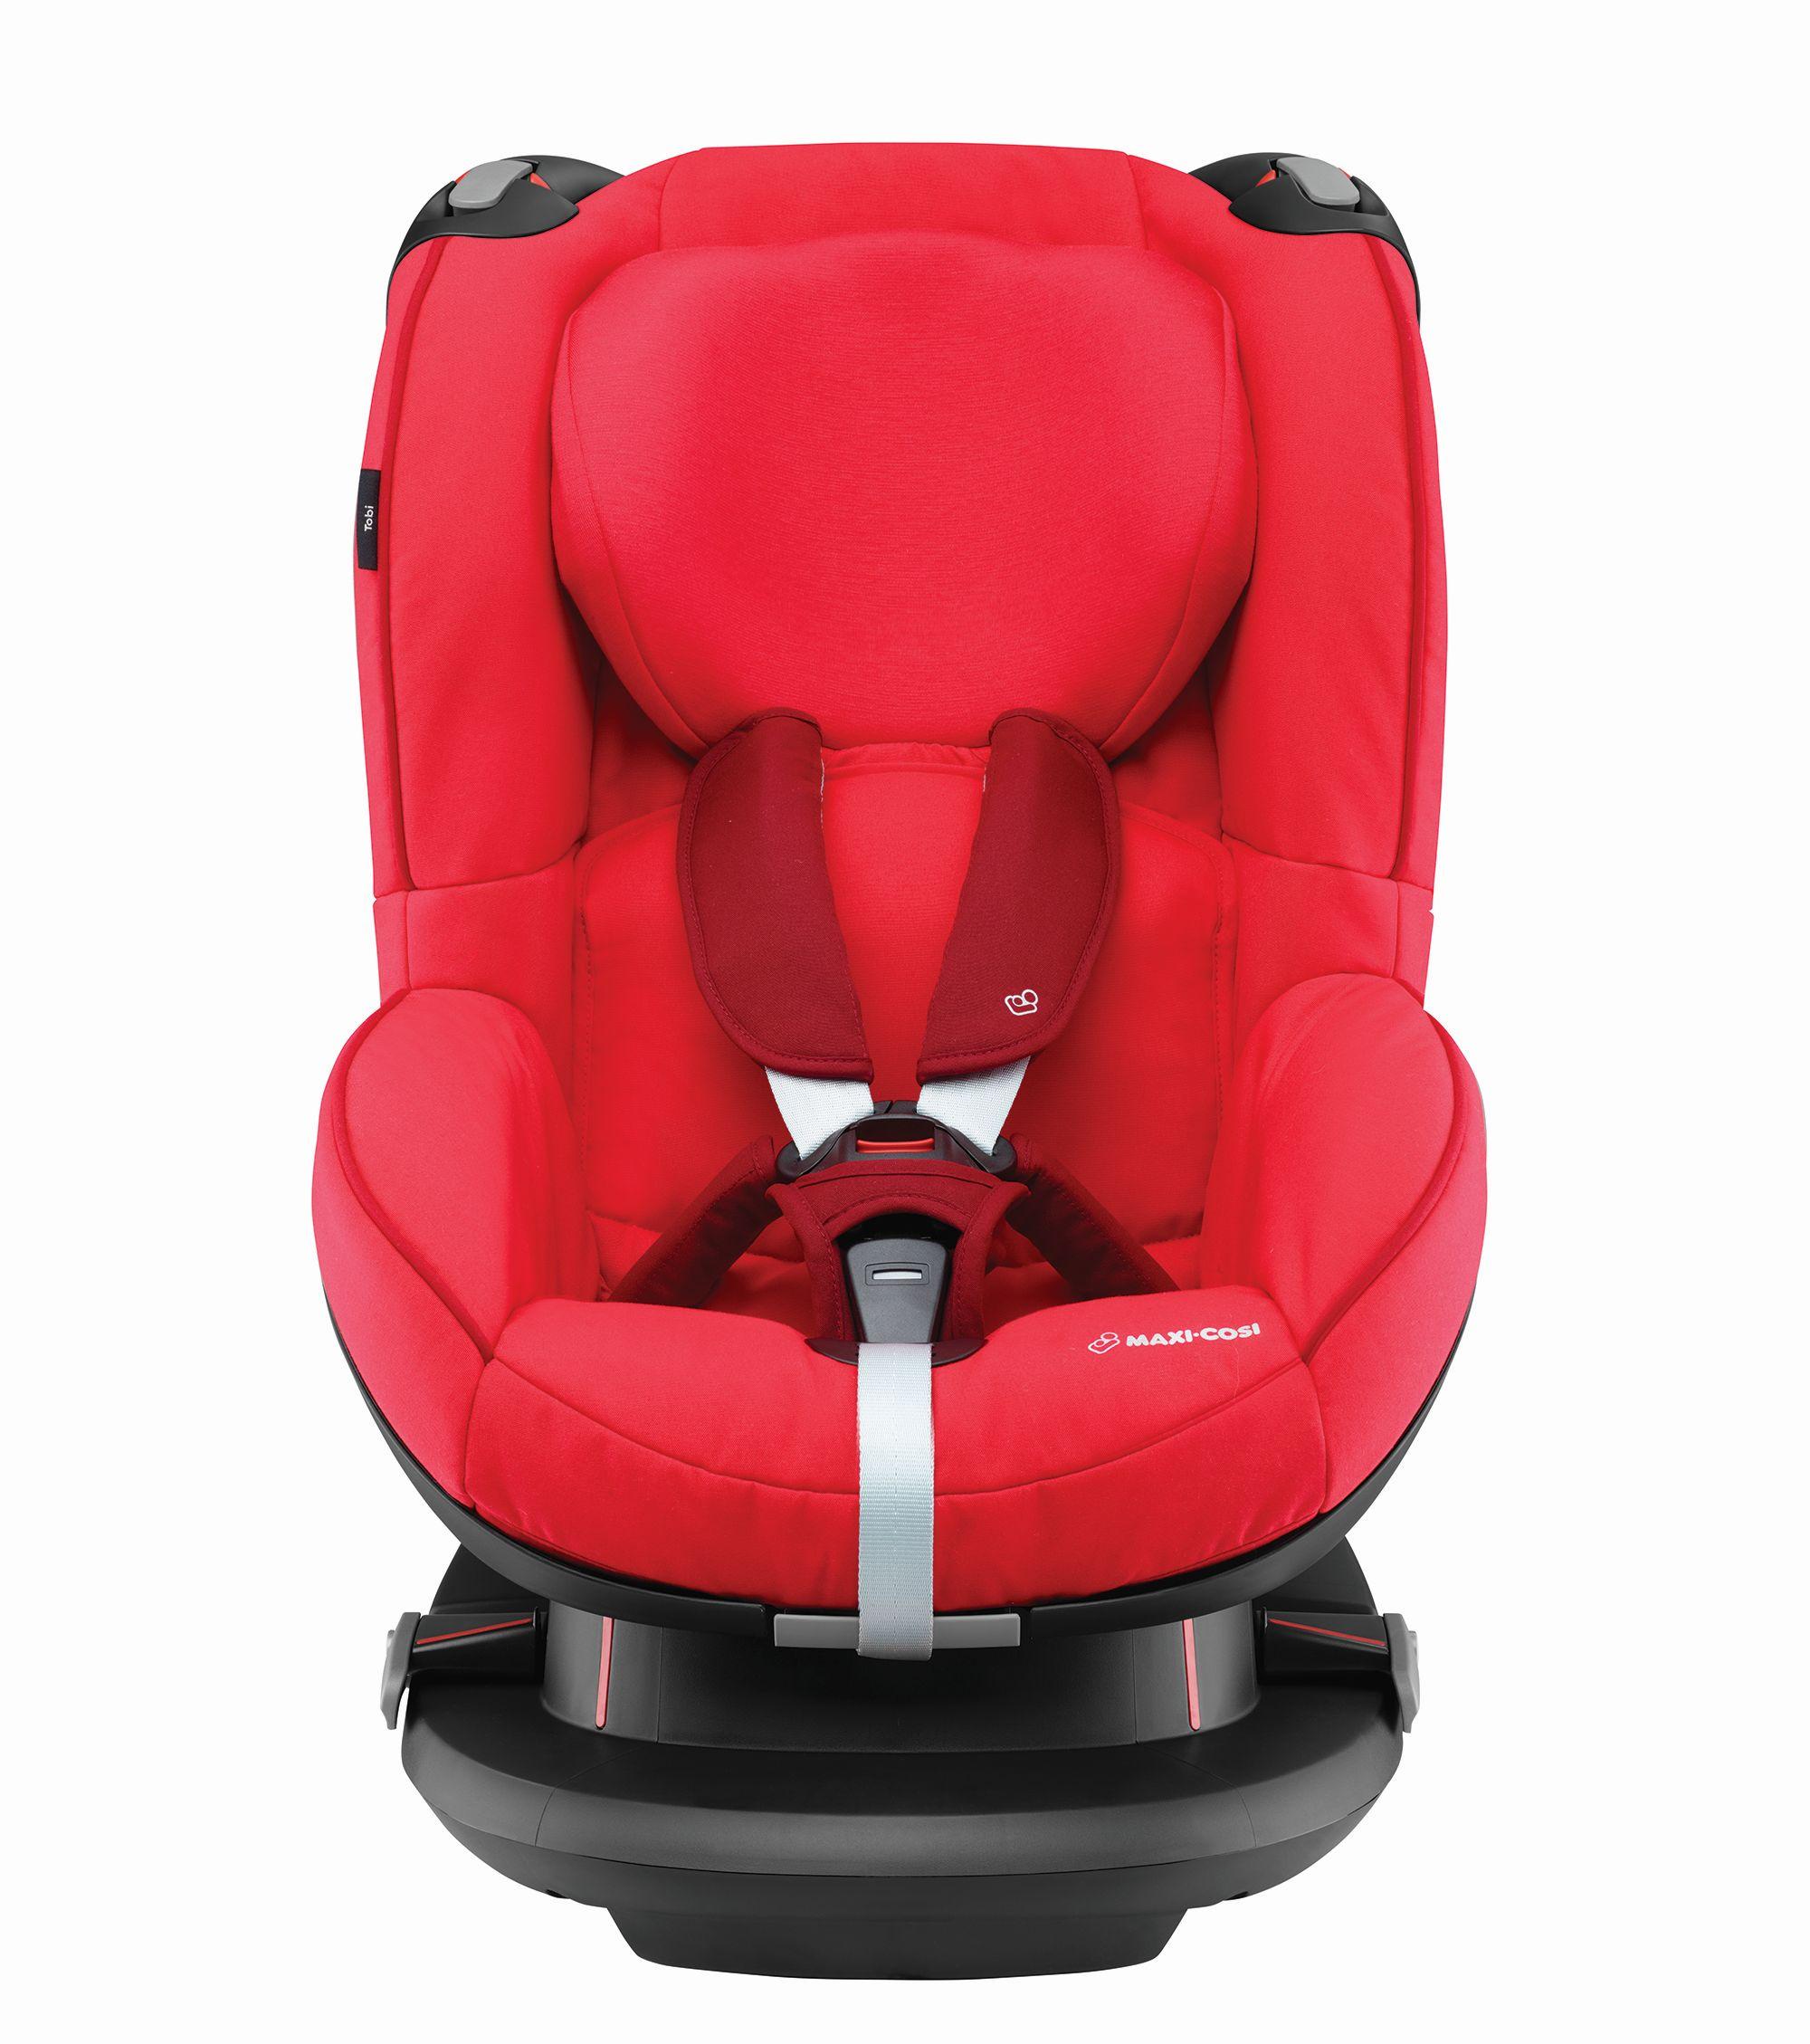 maxi cosi child car seat tobi 2018 vivid red buy at. Black Bedroom Furniture Sets. Home Design Ideas